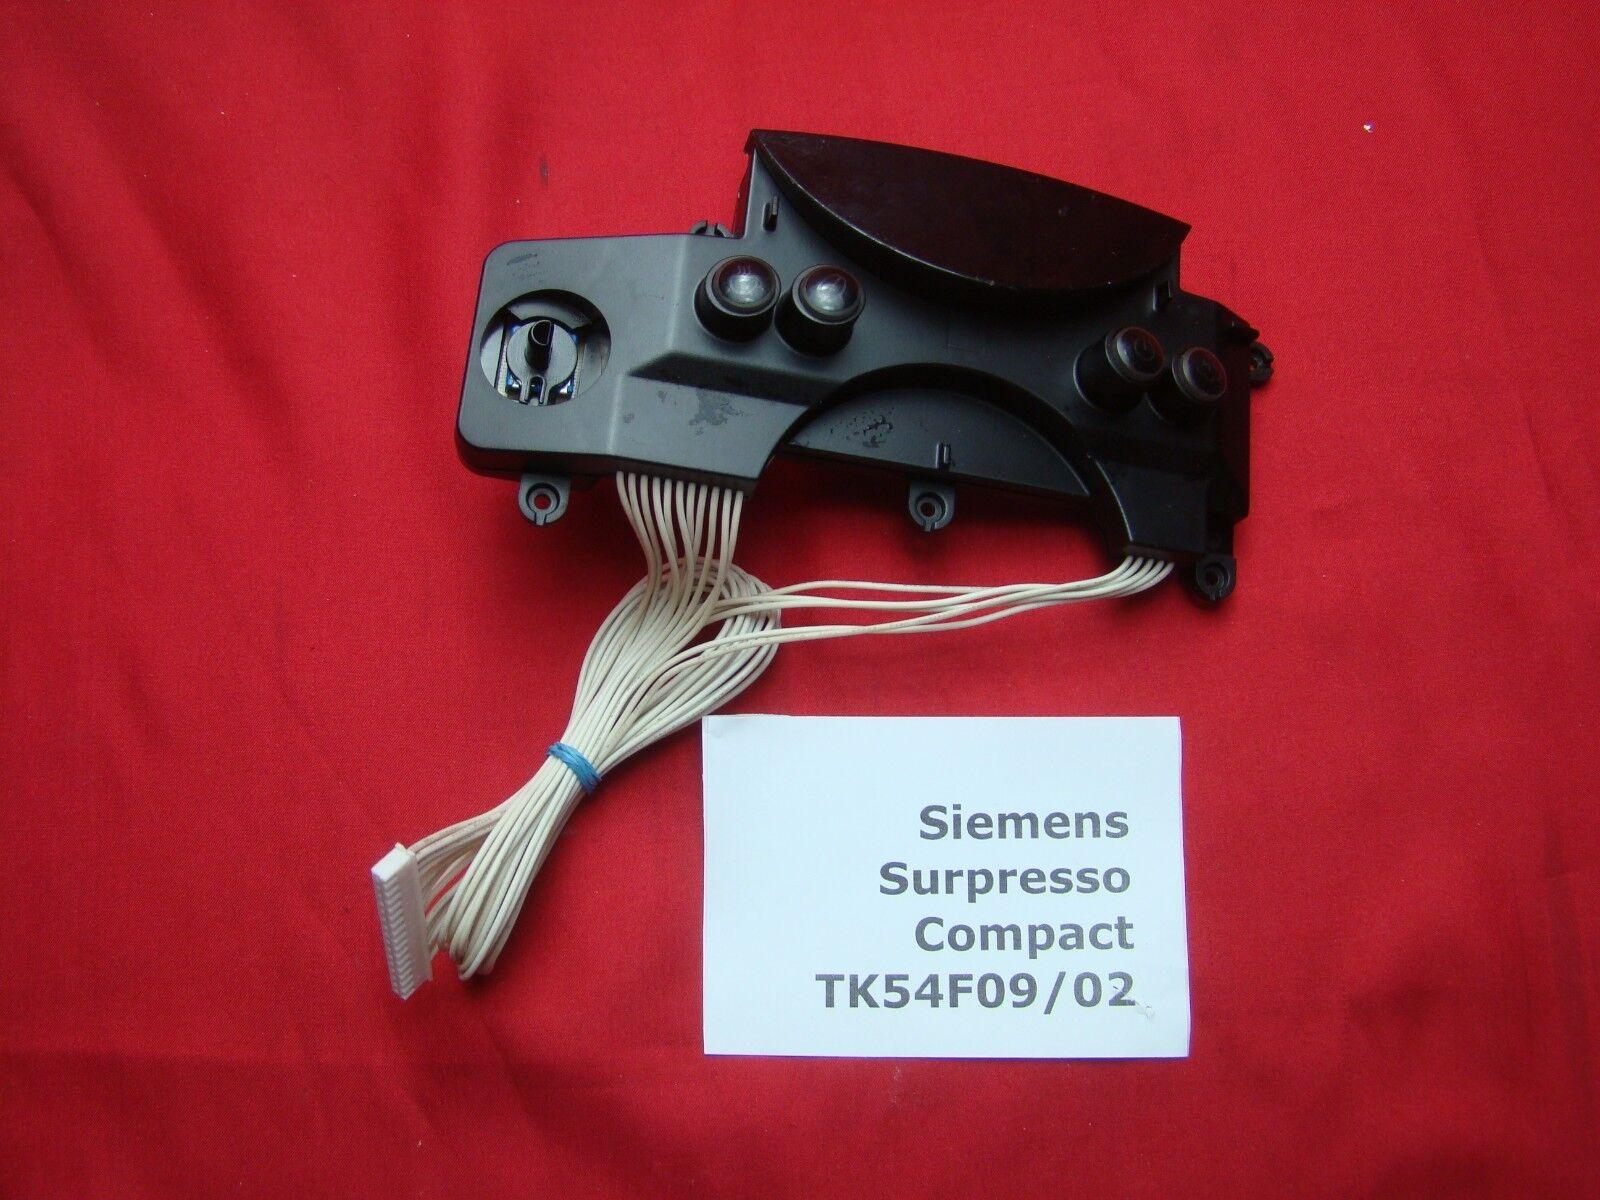 Siemens Surpresso Compact Anzeigeelektronik Print Control Board 0048219